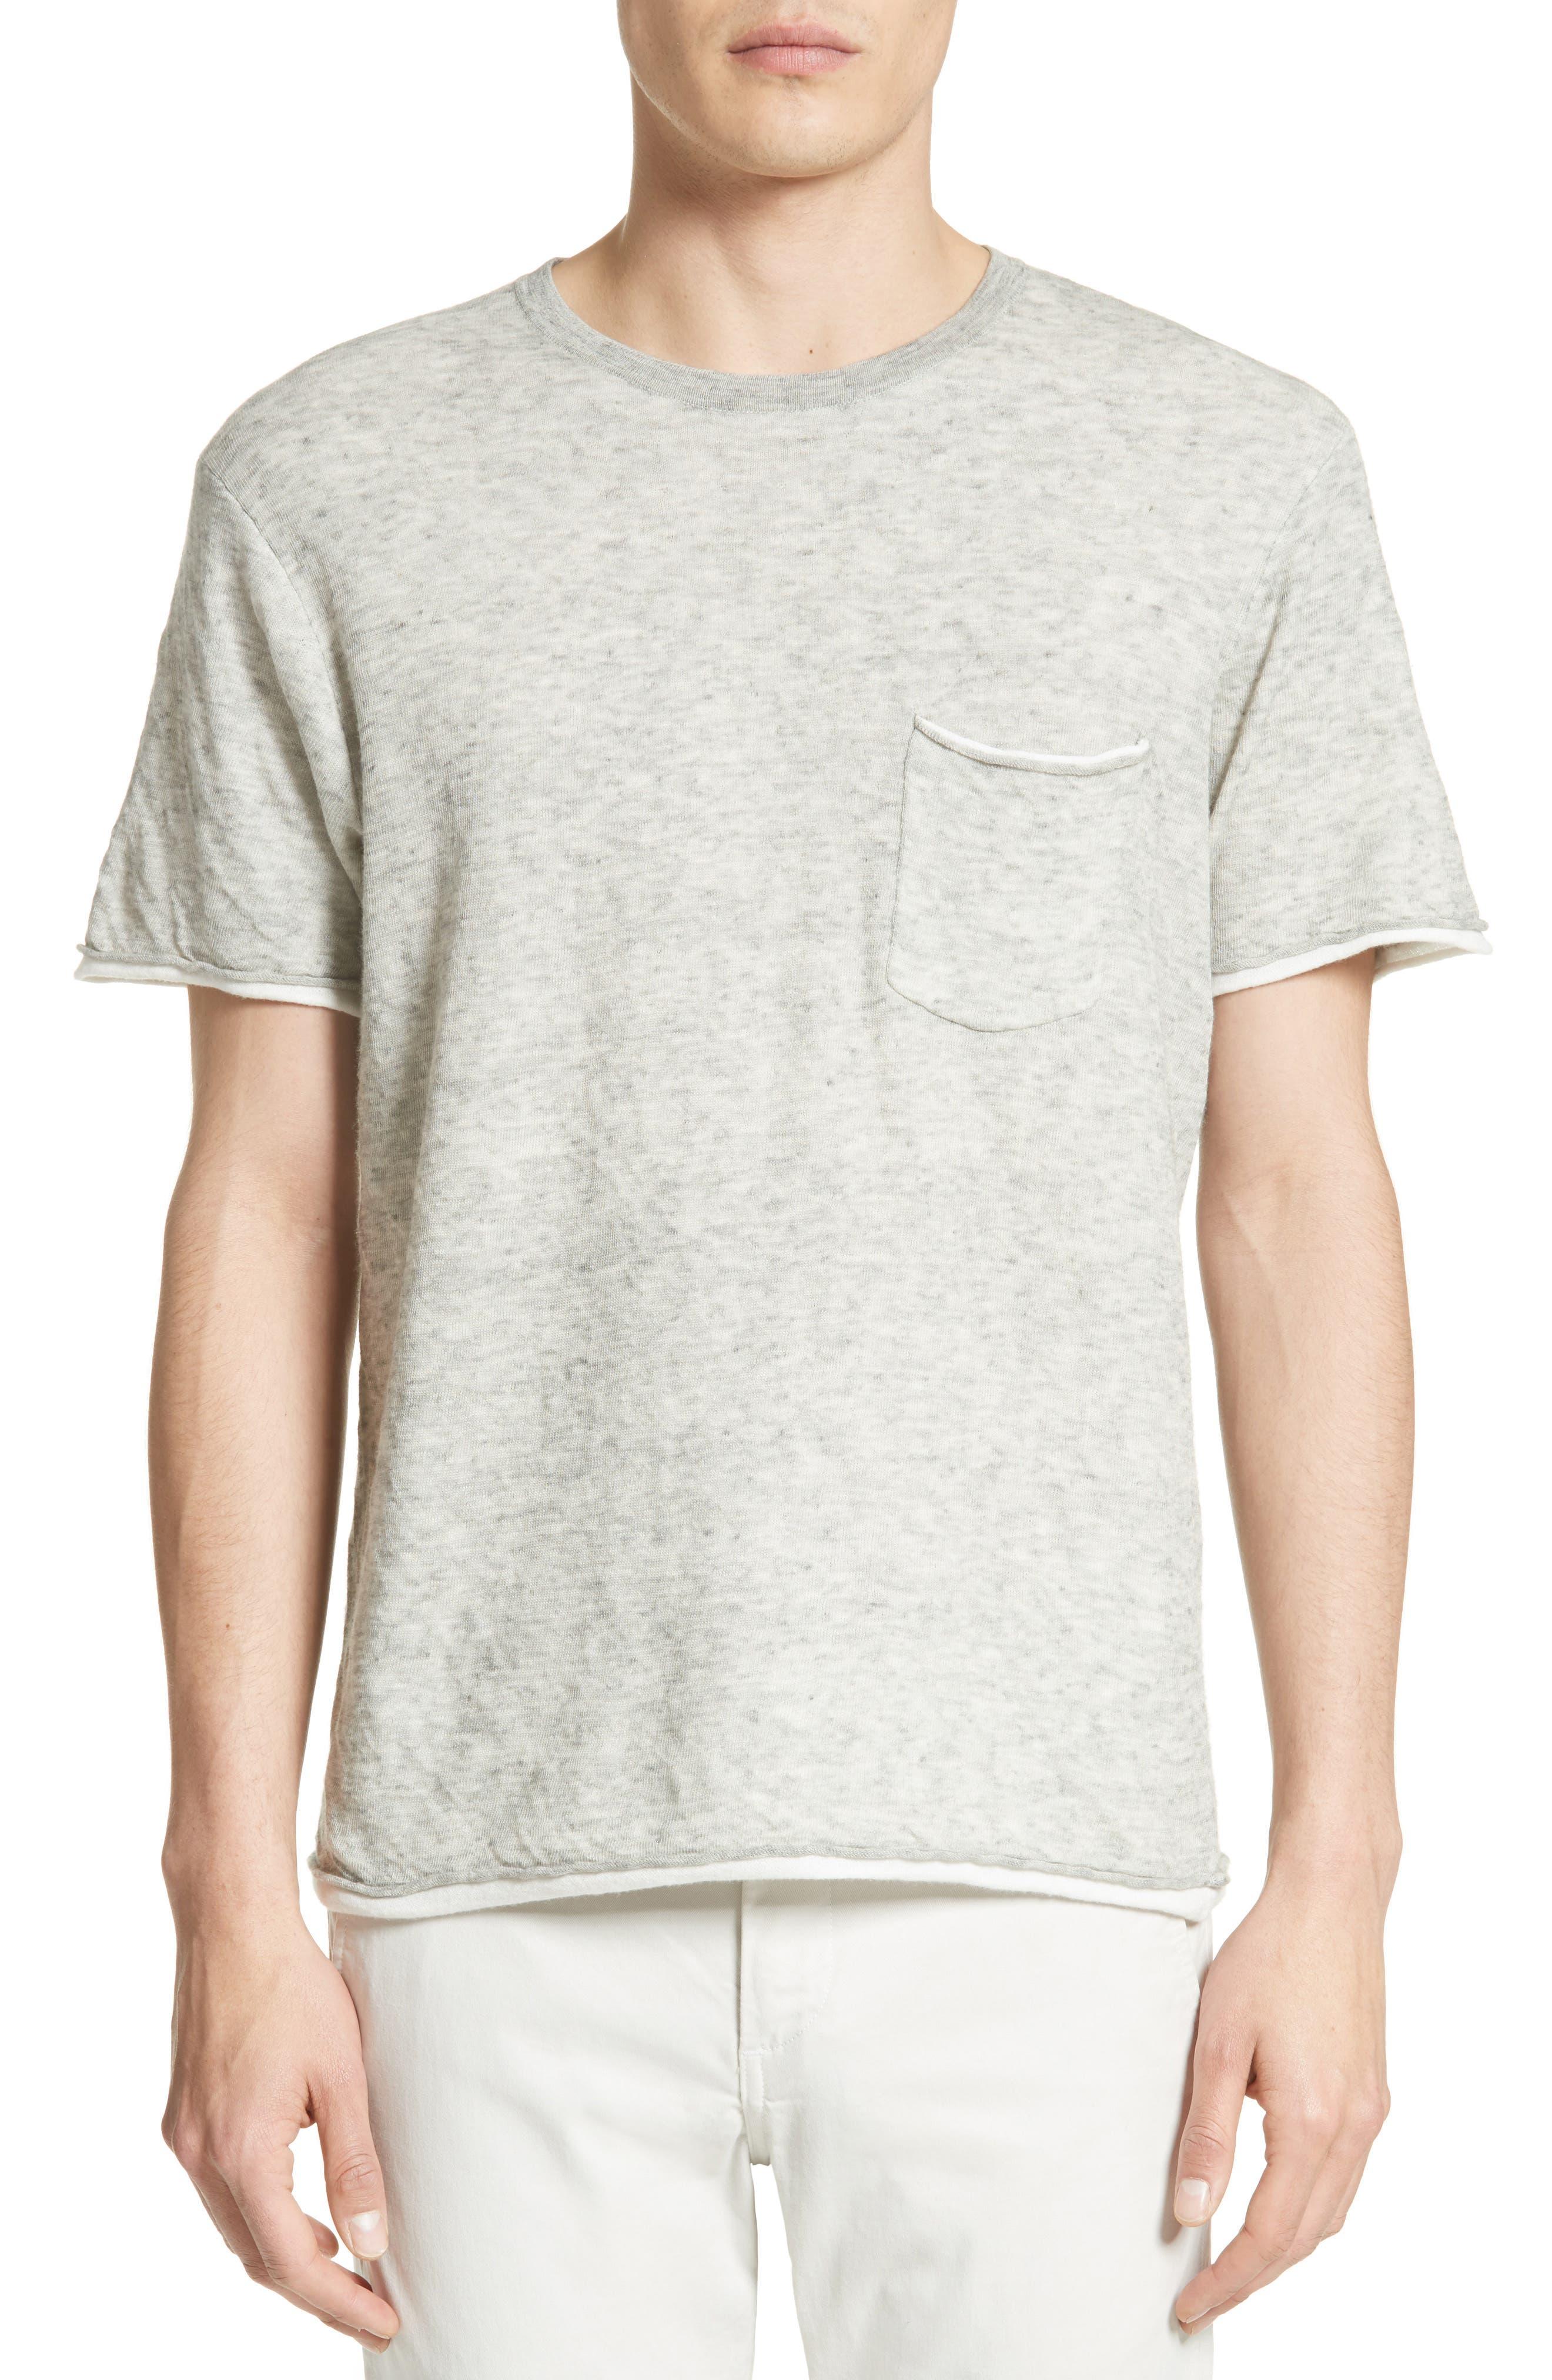 Tripp Cotton & Wool T-Shirt,                         Main,                         color, Grey/ White